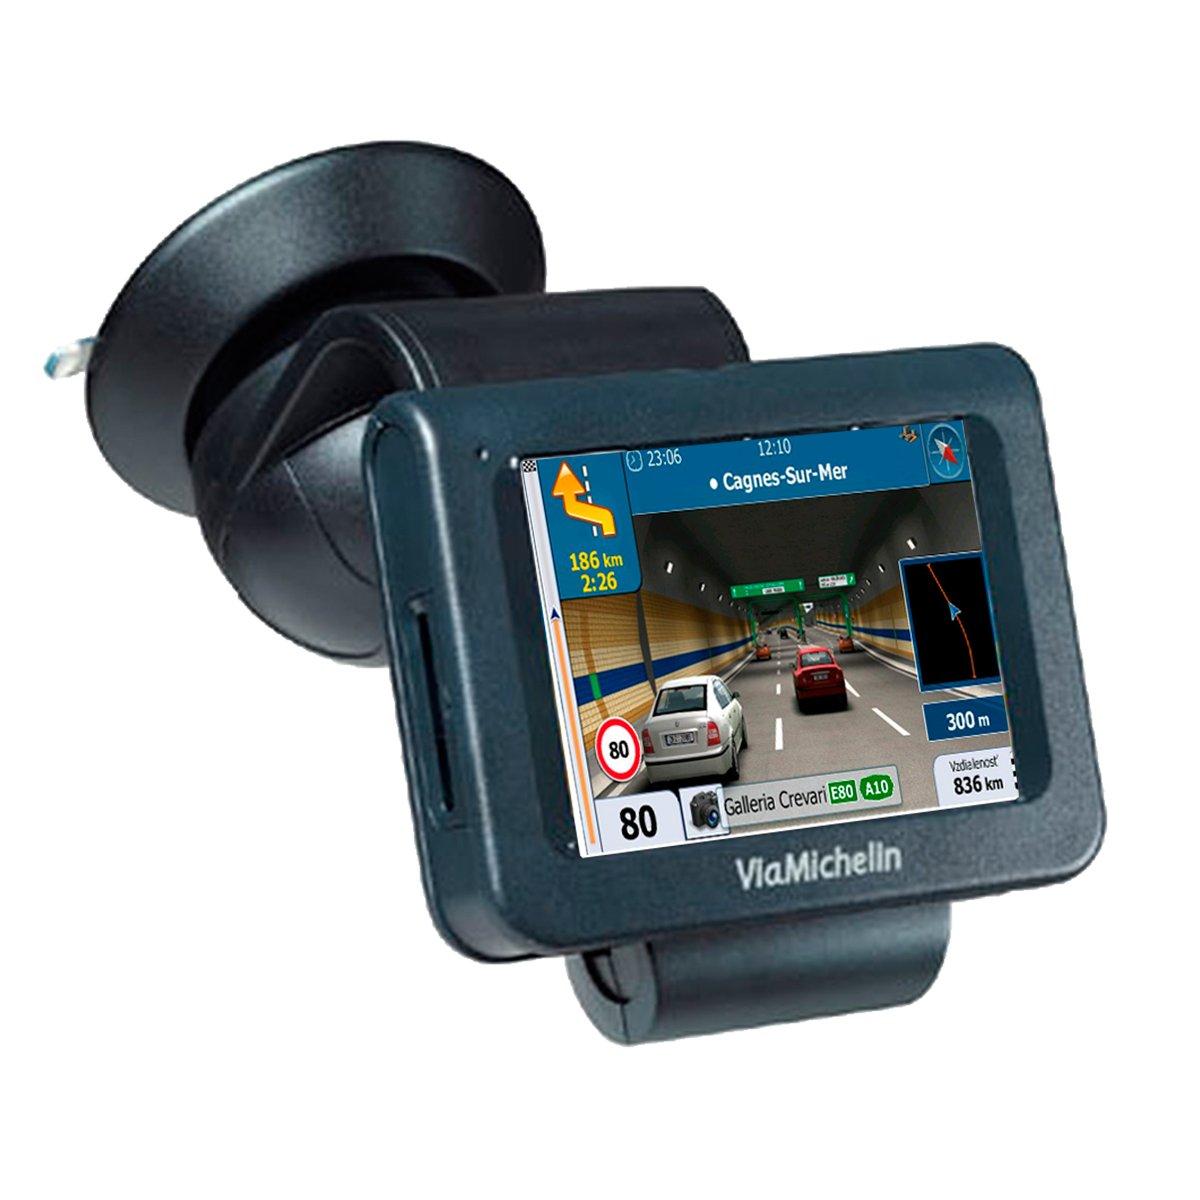 Navegador GPS con Avisador de Radares Actualizable Chip Sirf III Soporte de Ventosa para Cristal BVC